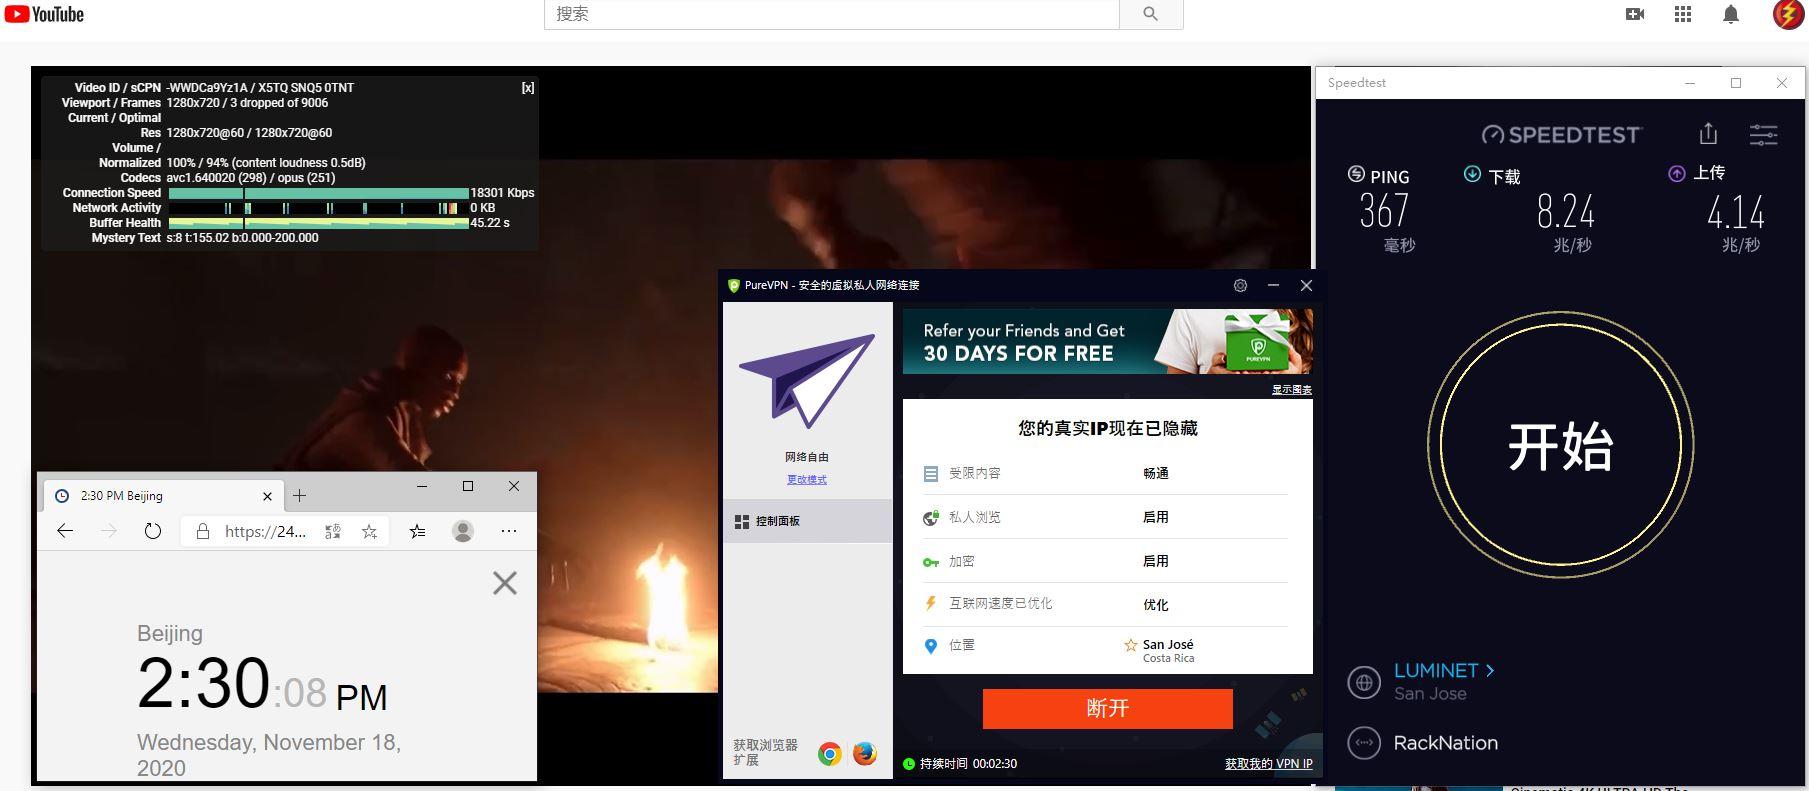 Windows10 PureVPN Costa Rica 服务器 中国VPN 翻墙 科学上网 测试 - 20201118